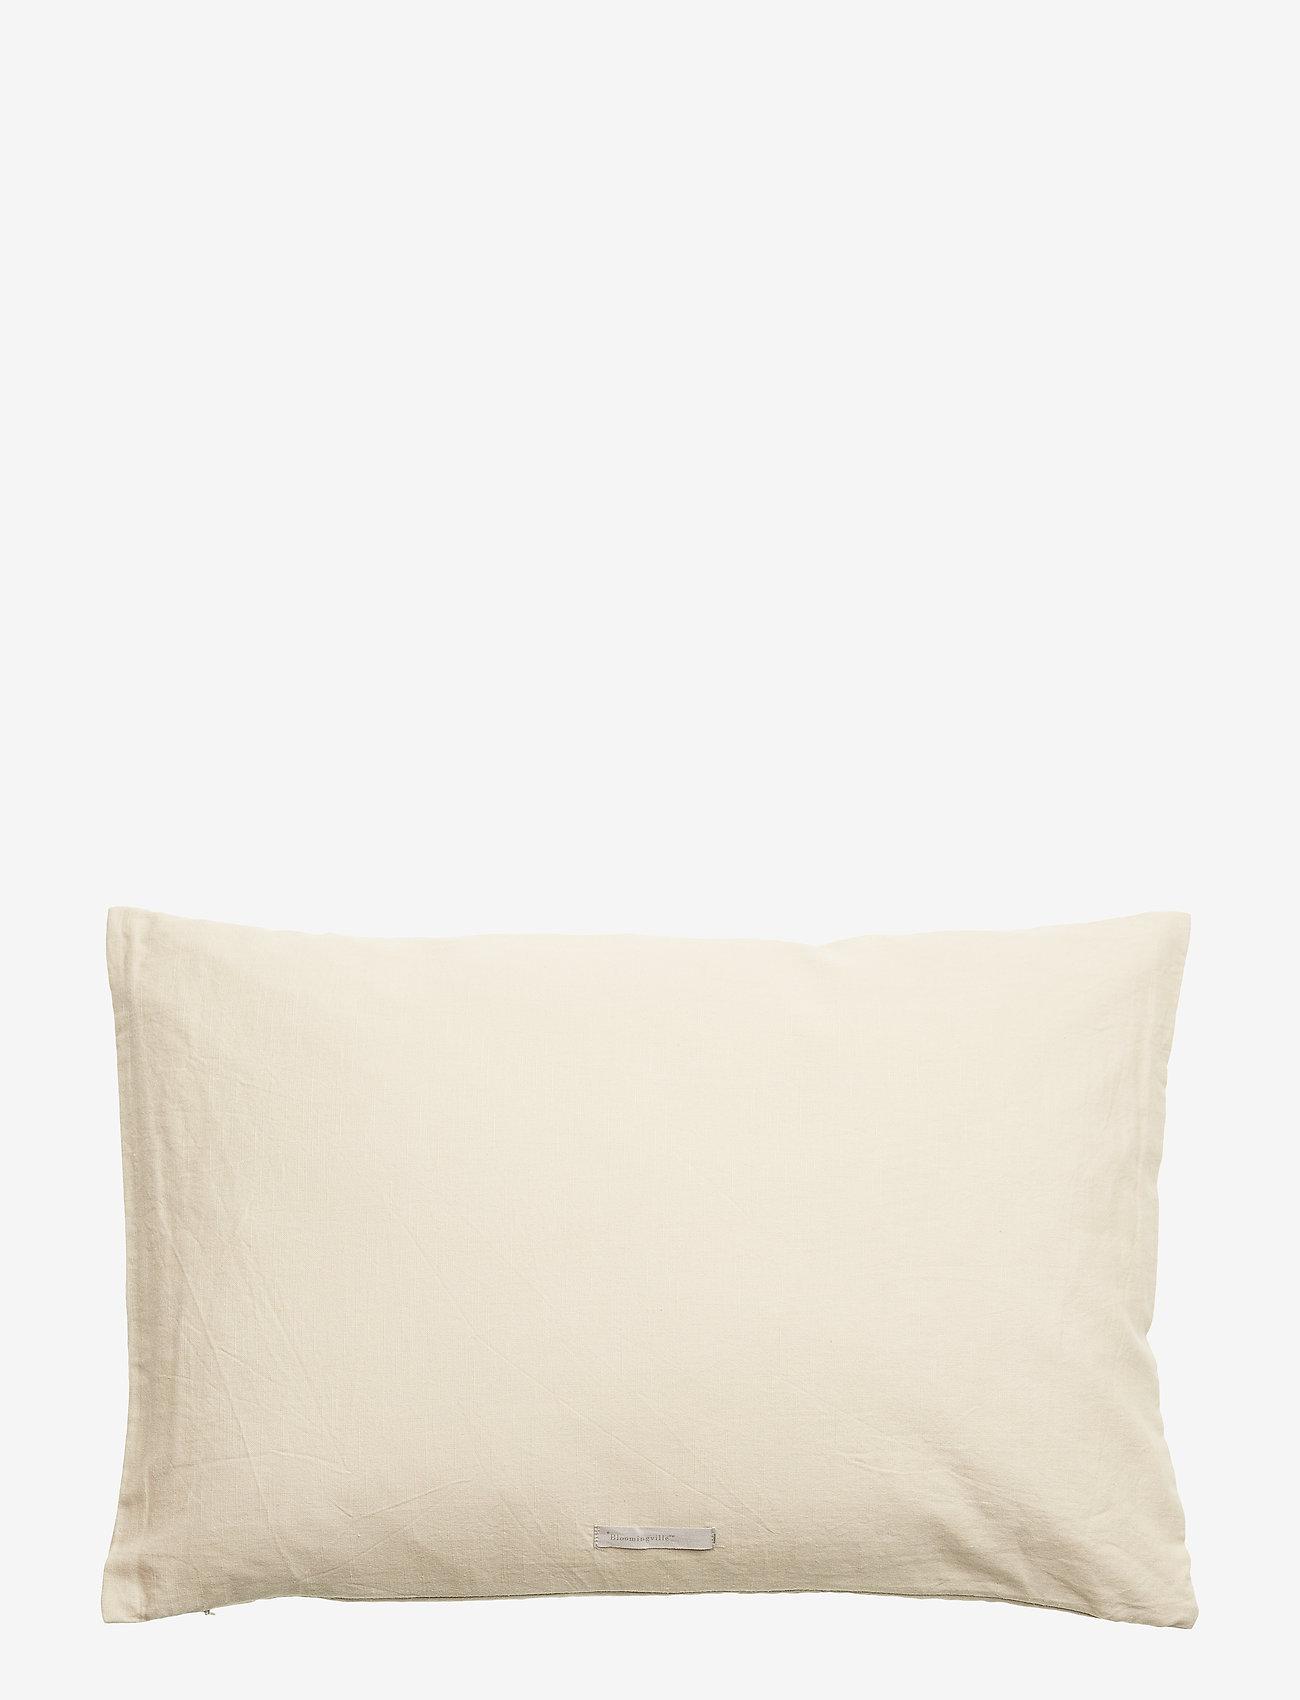 Bloomingville - Honesty Cushion, Grey, Cotton - poduszki ozdobne - grey - 1